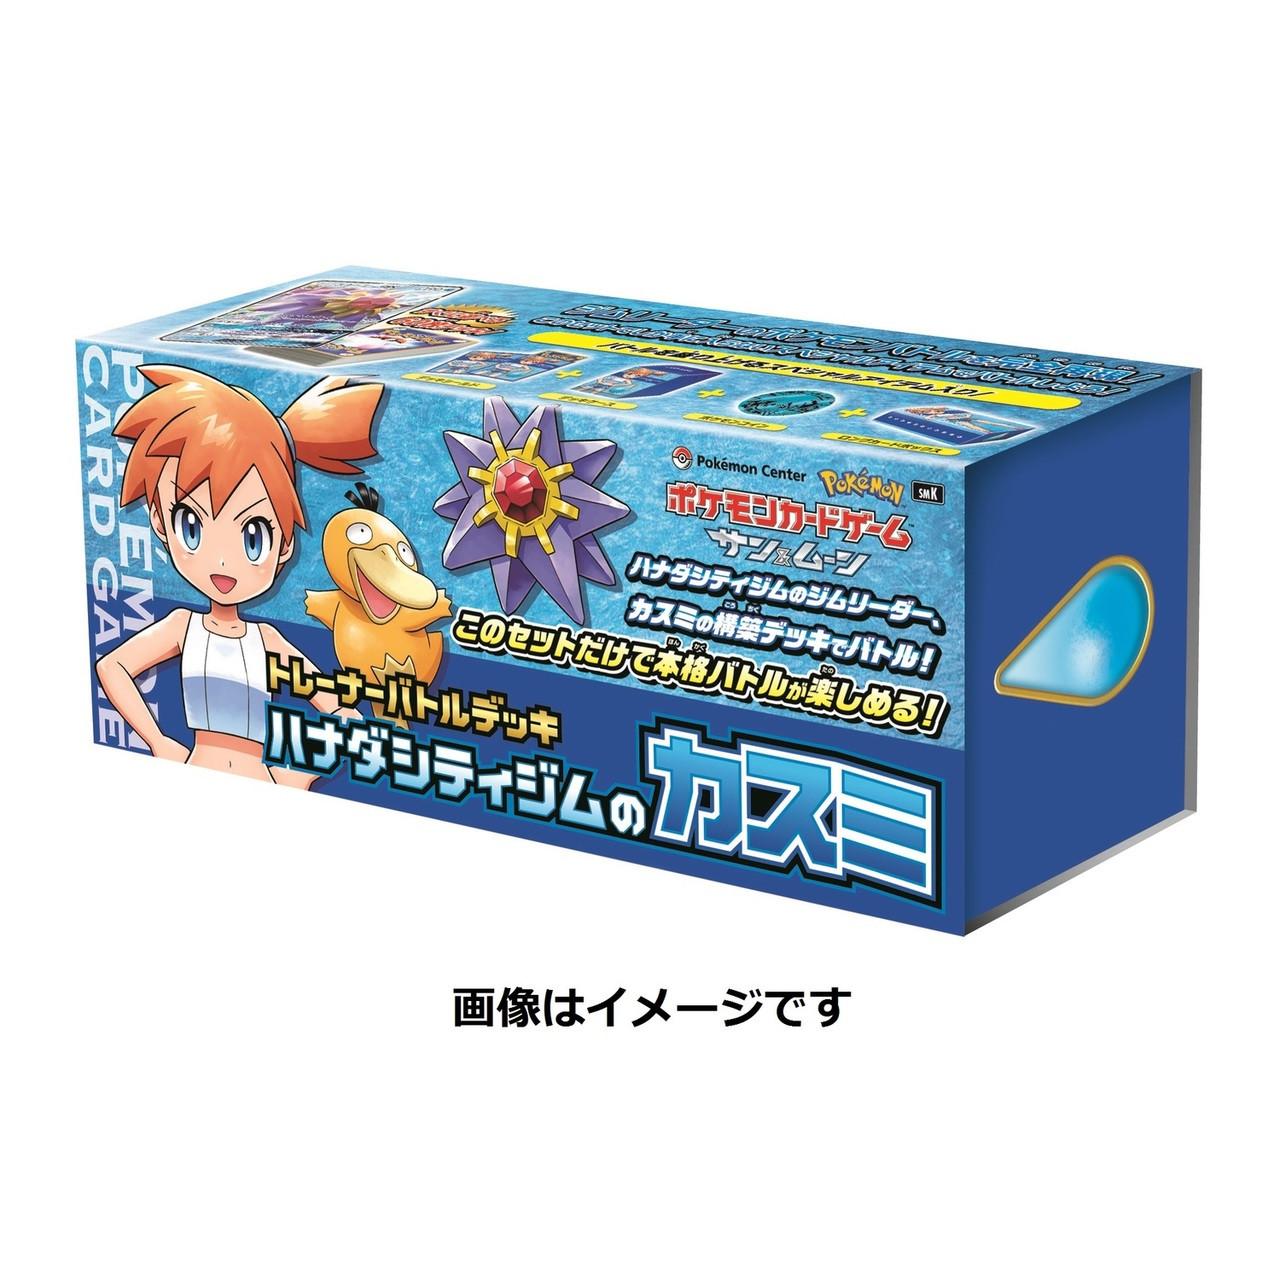 Takeshi Nibi City Gym F//S Pokesen Limited Pokemon Center Trainer Battle Deck